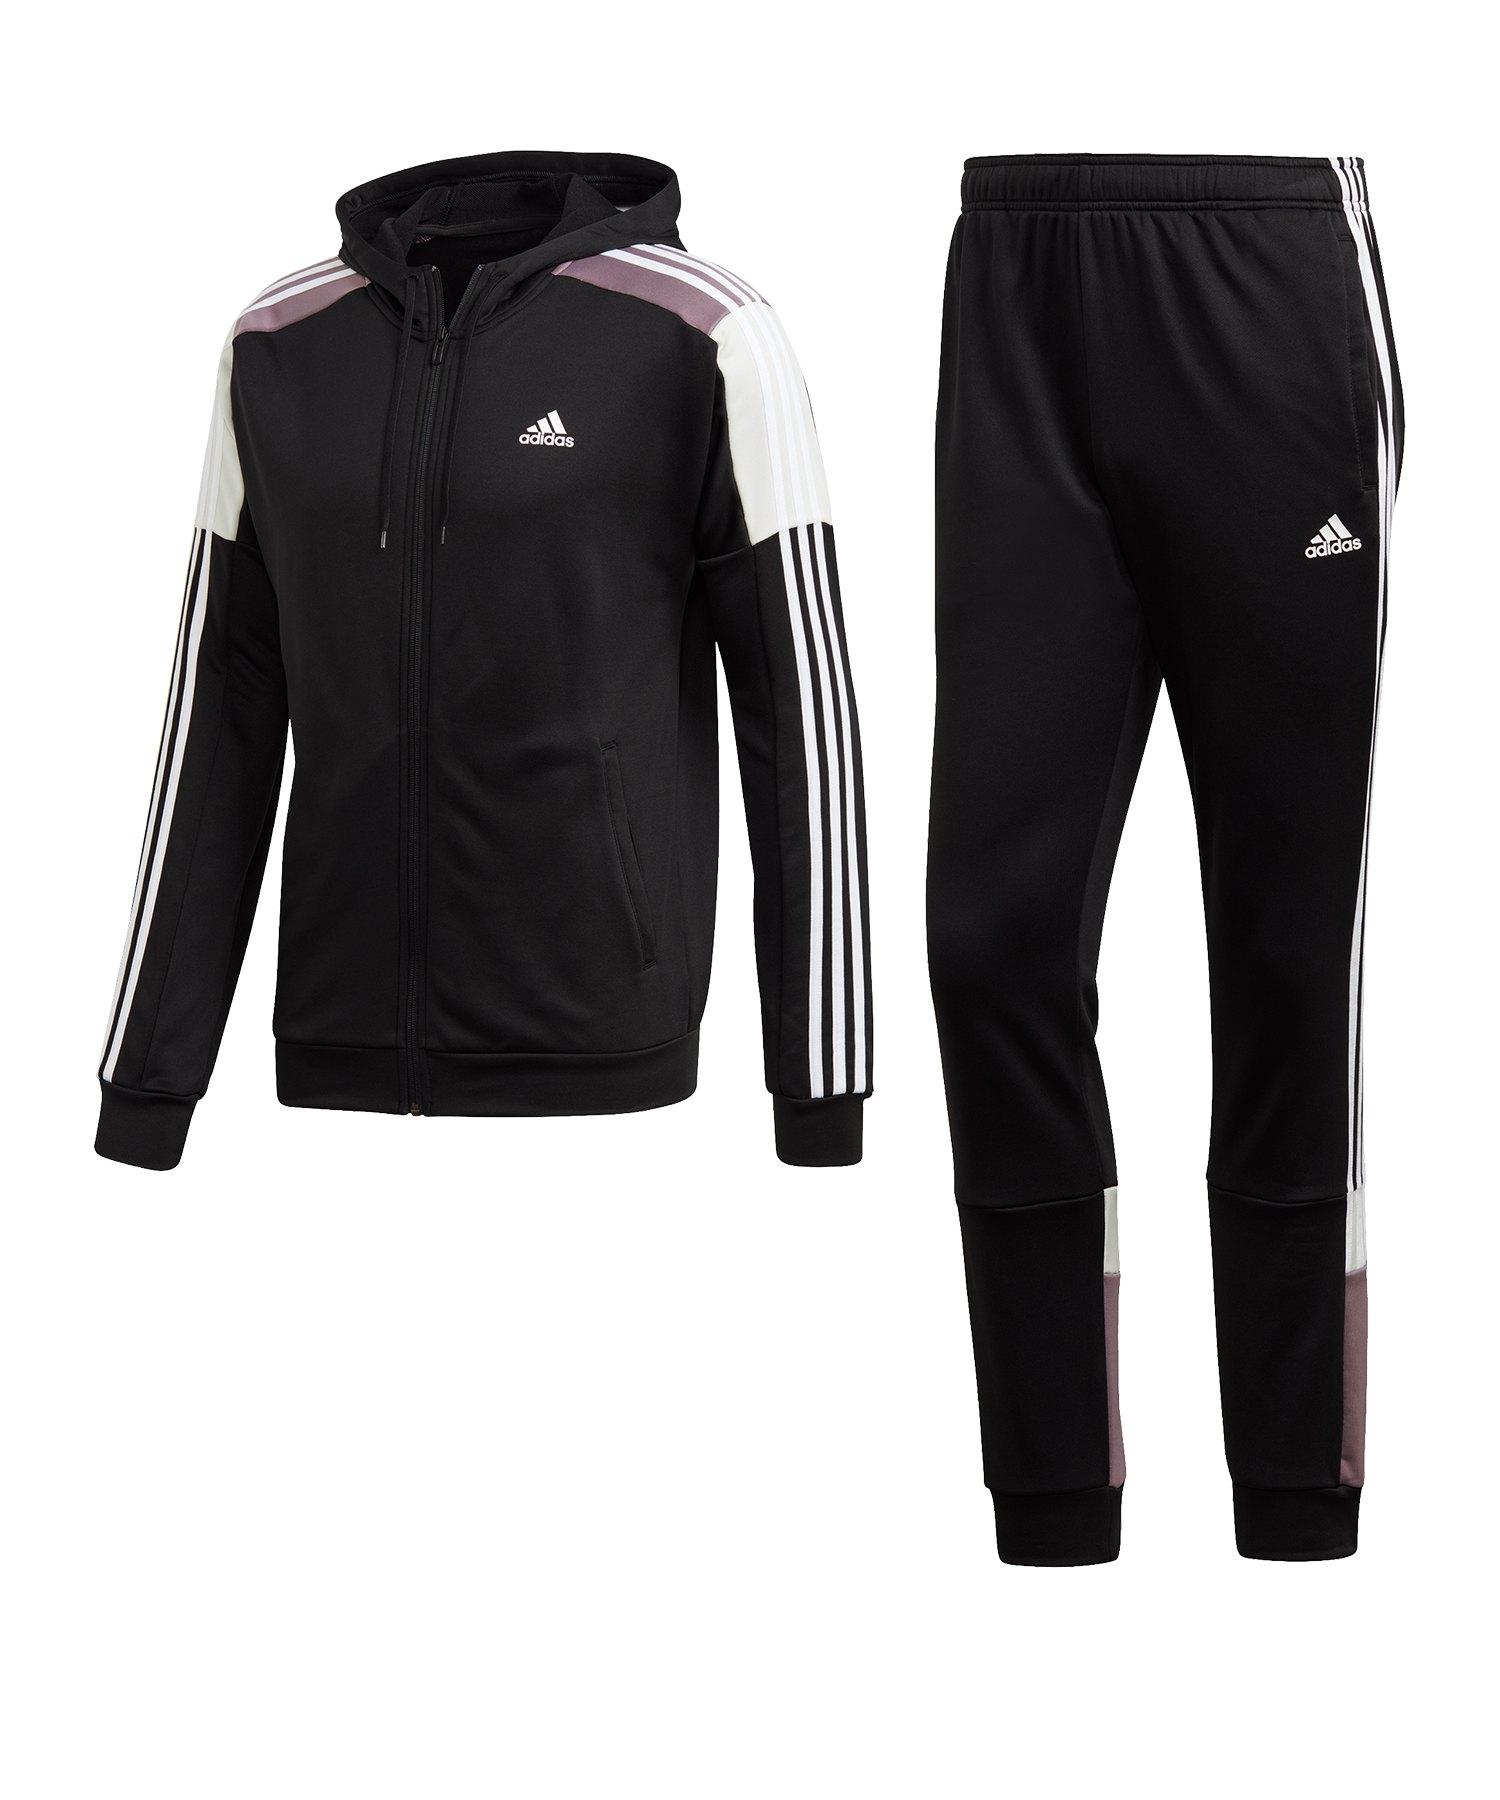 adidas MTS Sport Trainingsanzug Schwarz Weiss - schwarz